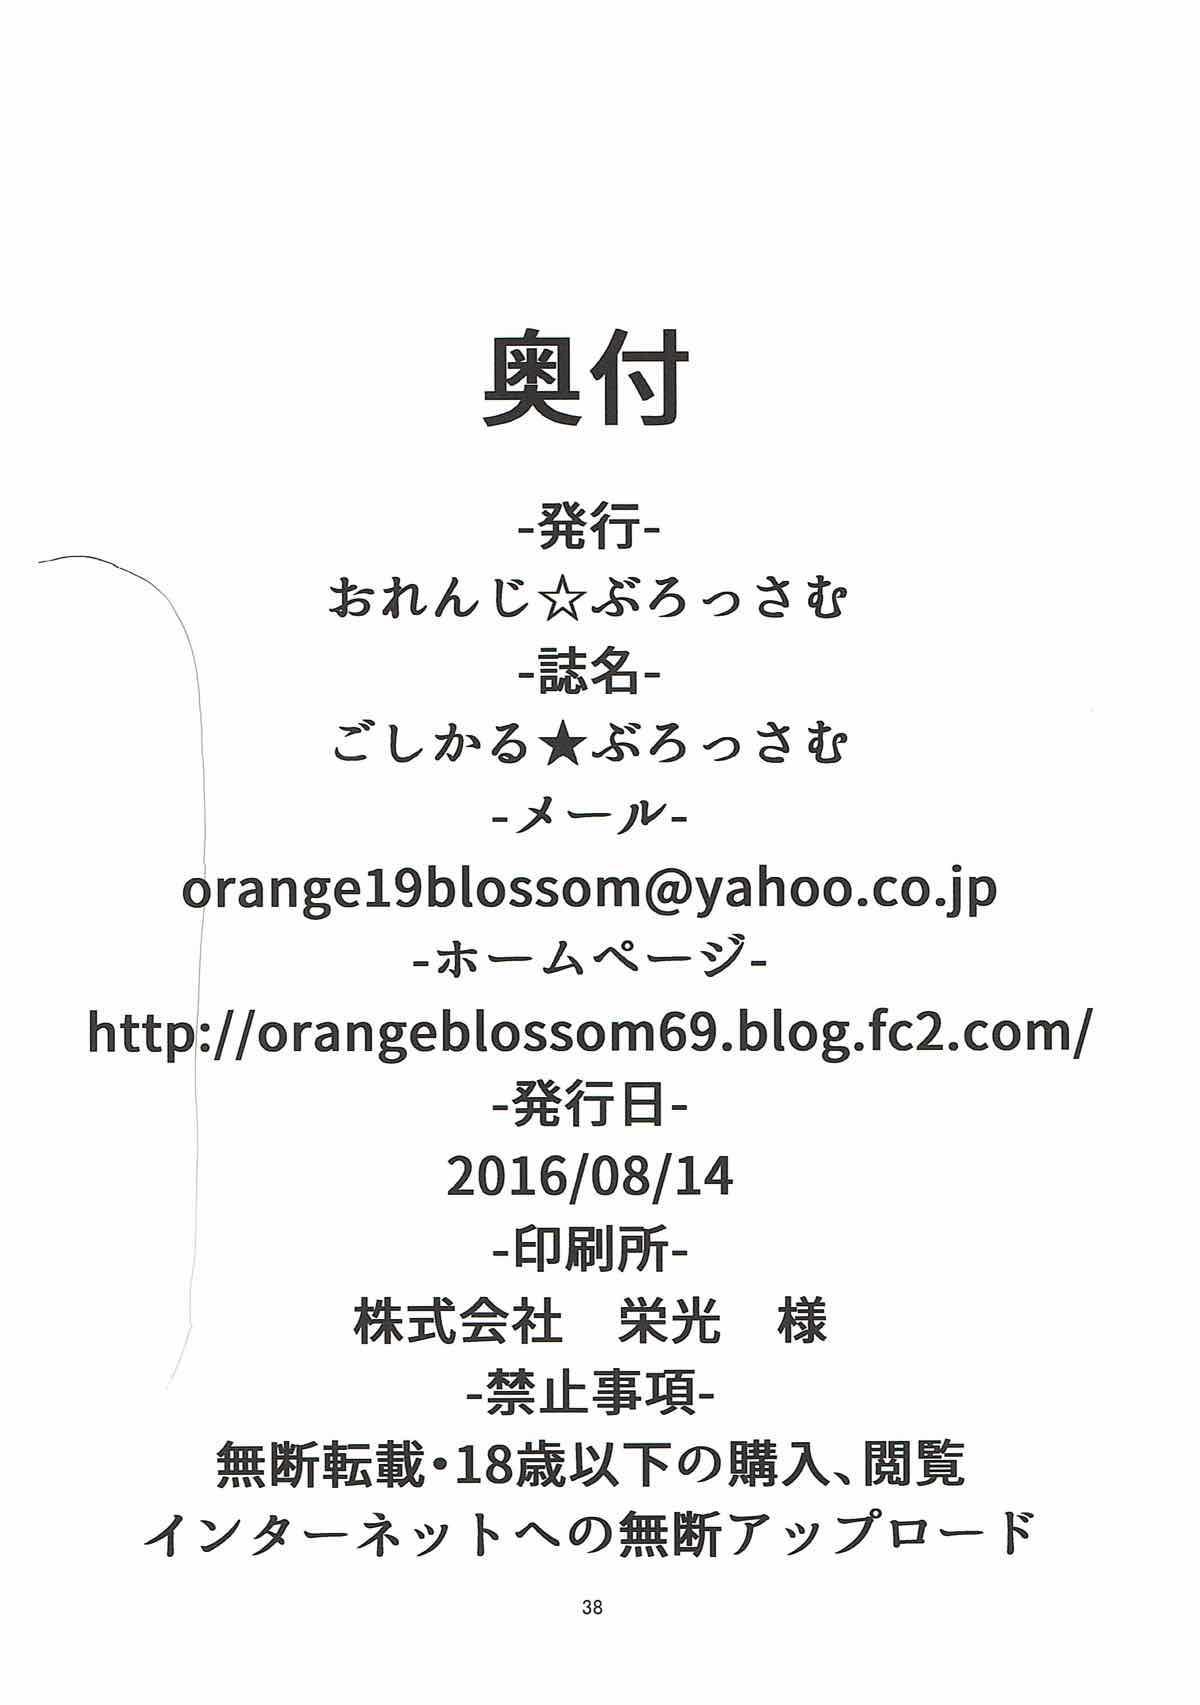 (C90) [Orange☆Blossom (Kakuka, shino)] Gothical★Blossom (THE IDOLM@STER CINDERELLA GIRLS)) 38